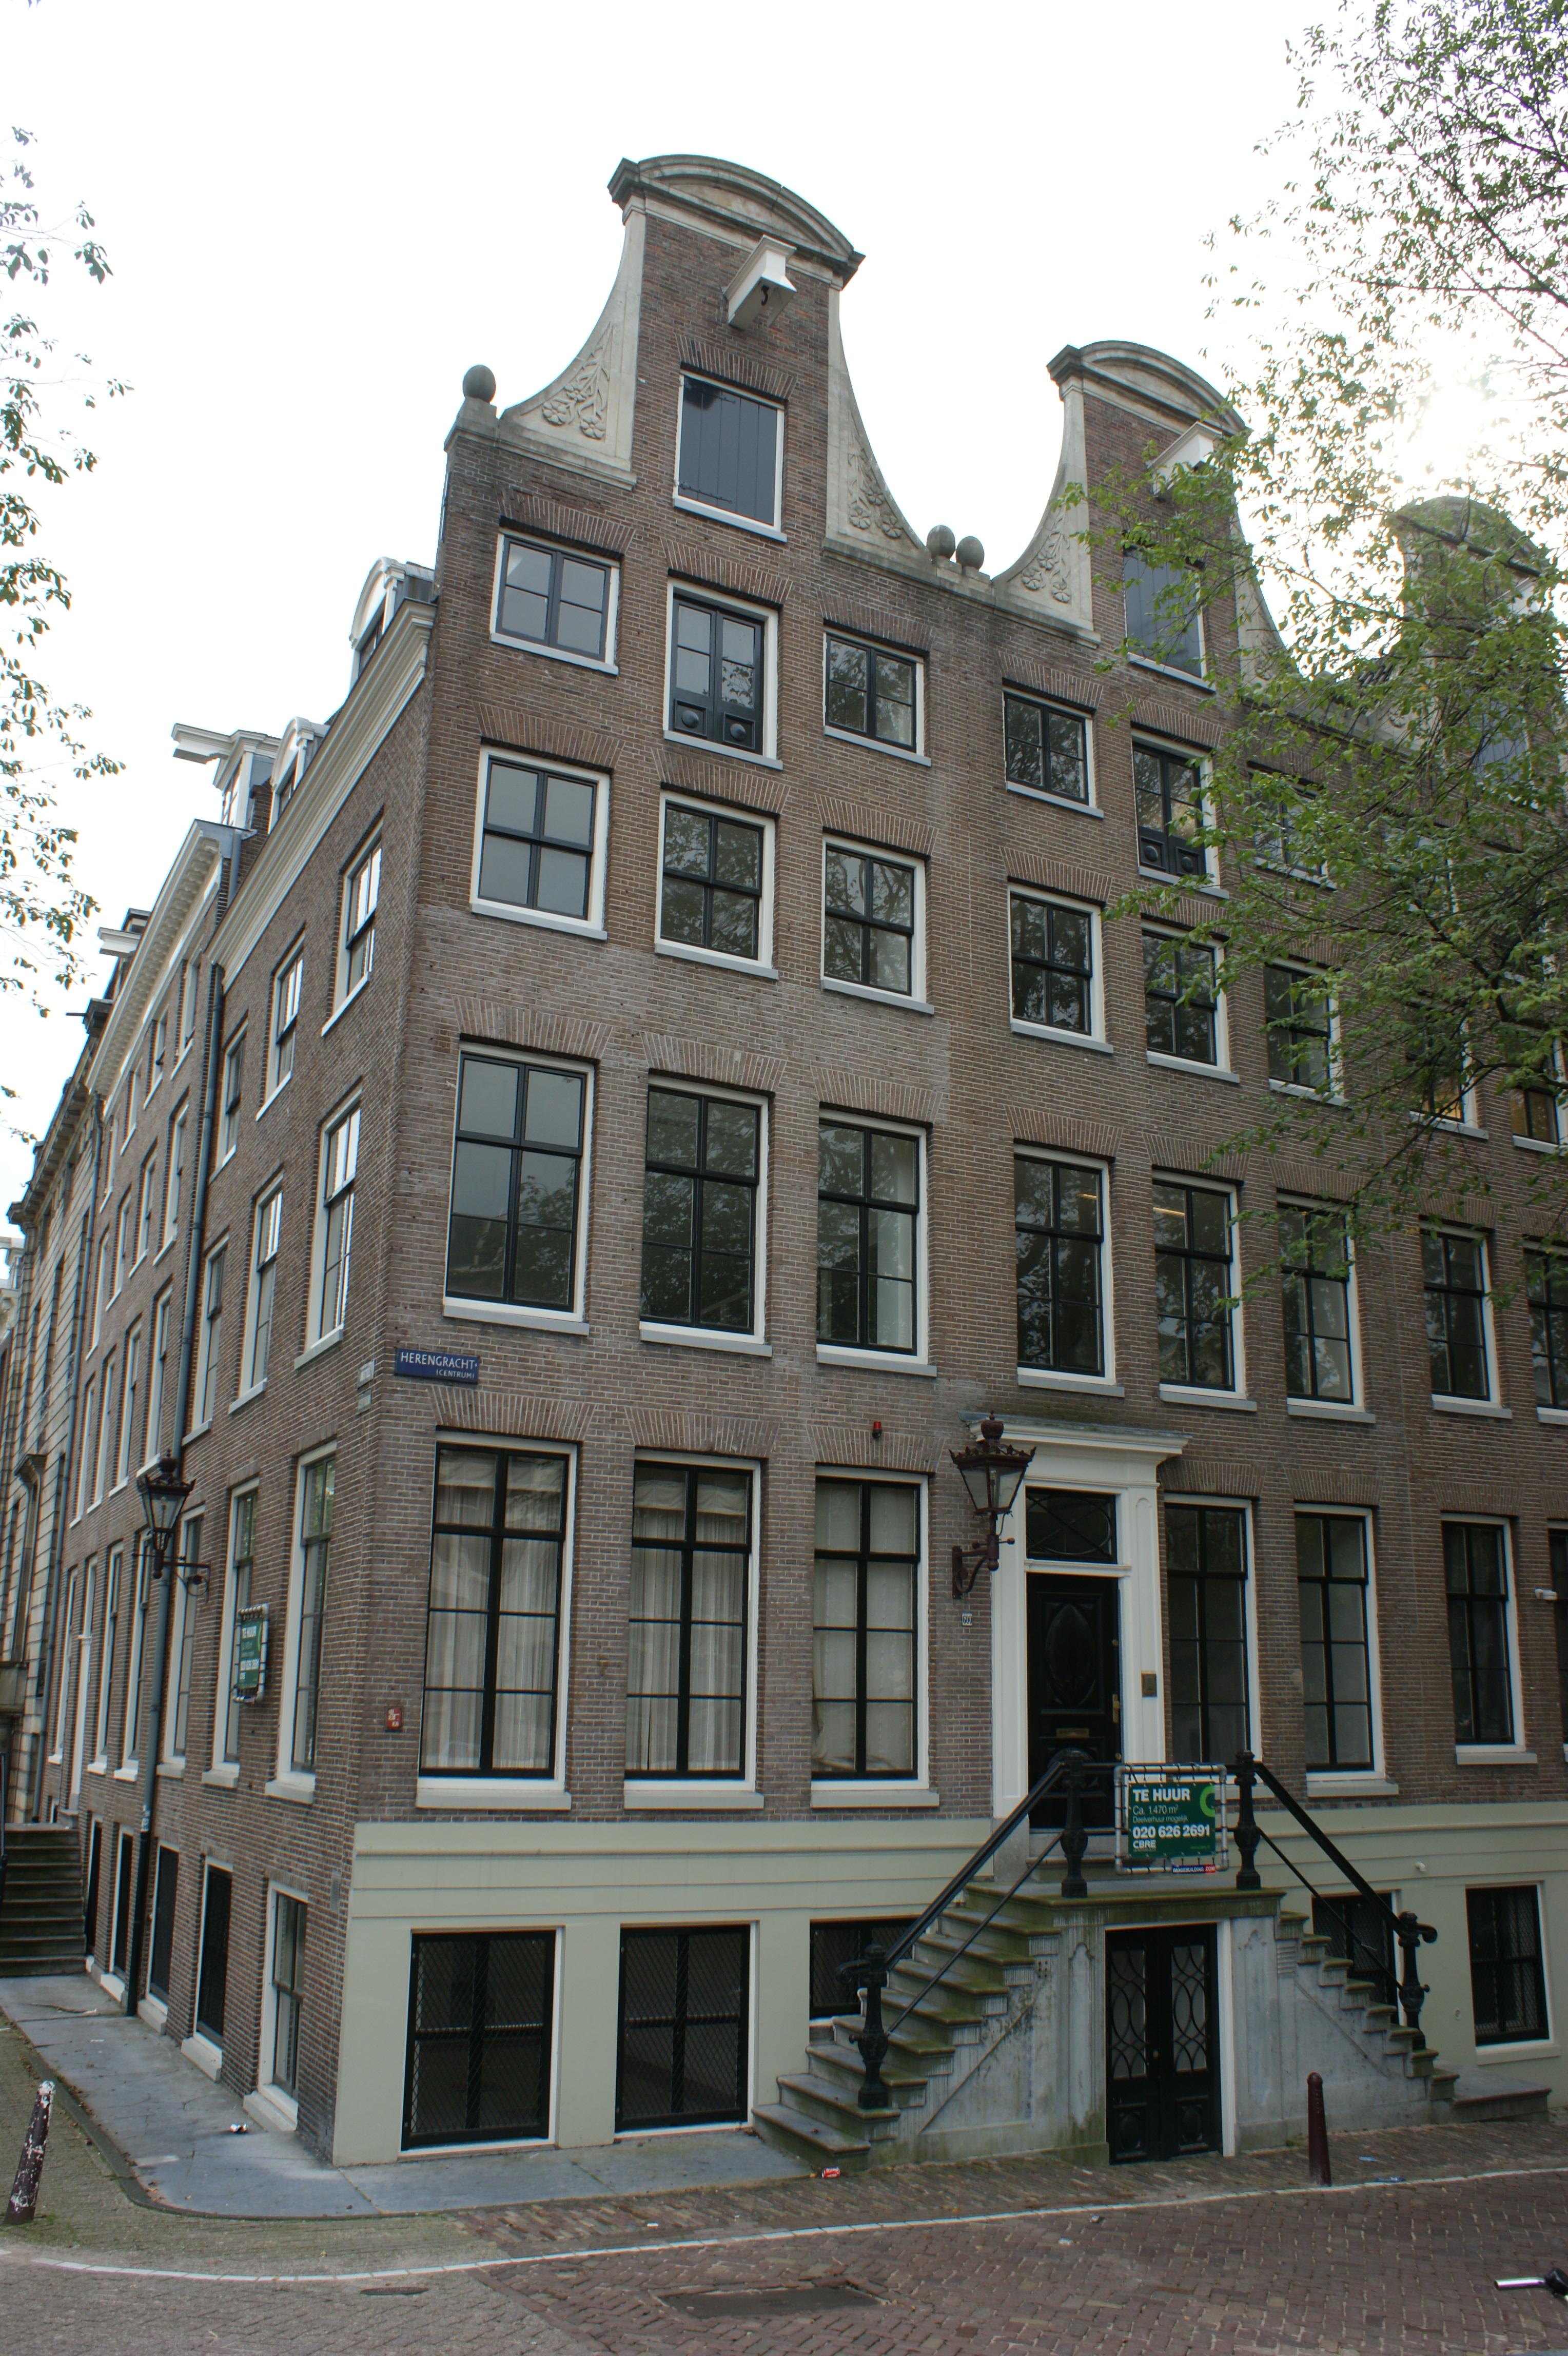 Huis met gevel in amsterdam monument - Huis gevel ...